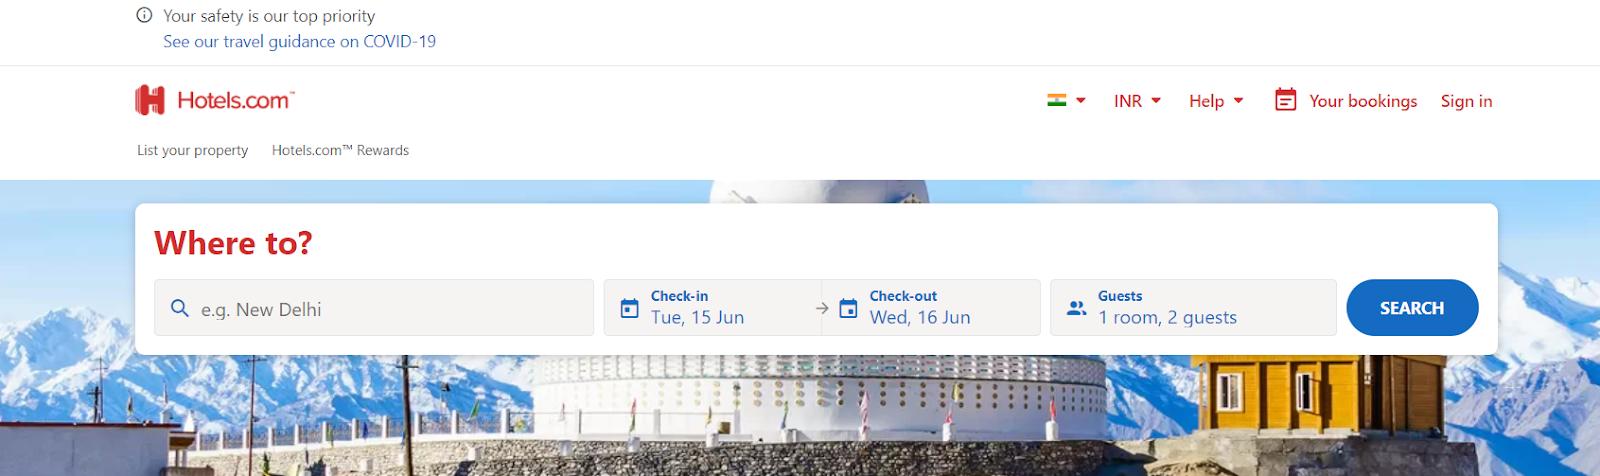 Screenshot of Hotels.com - Travel Search Engine